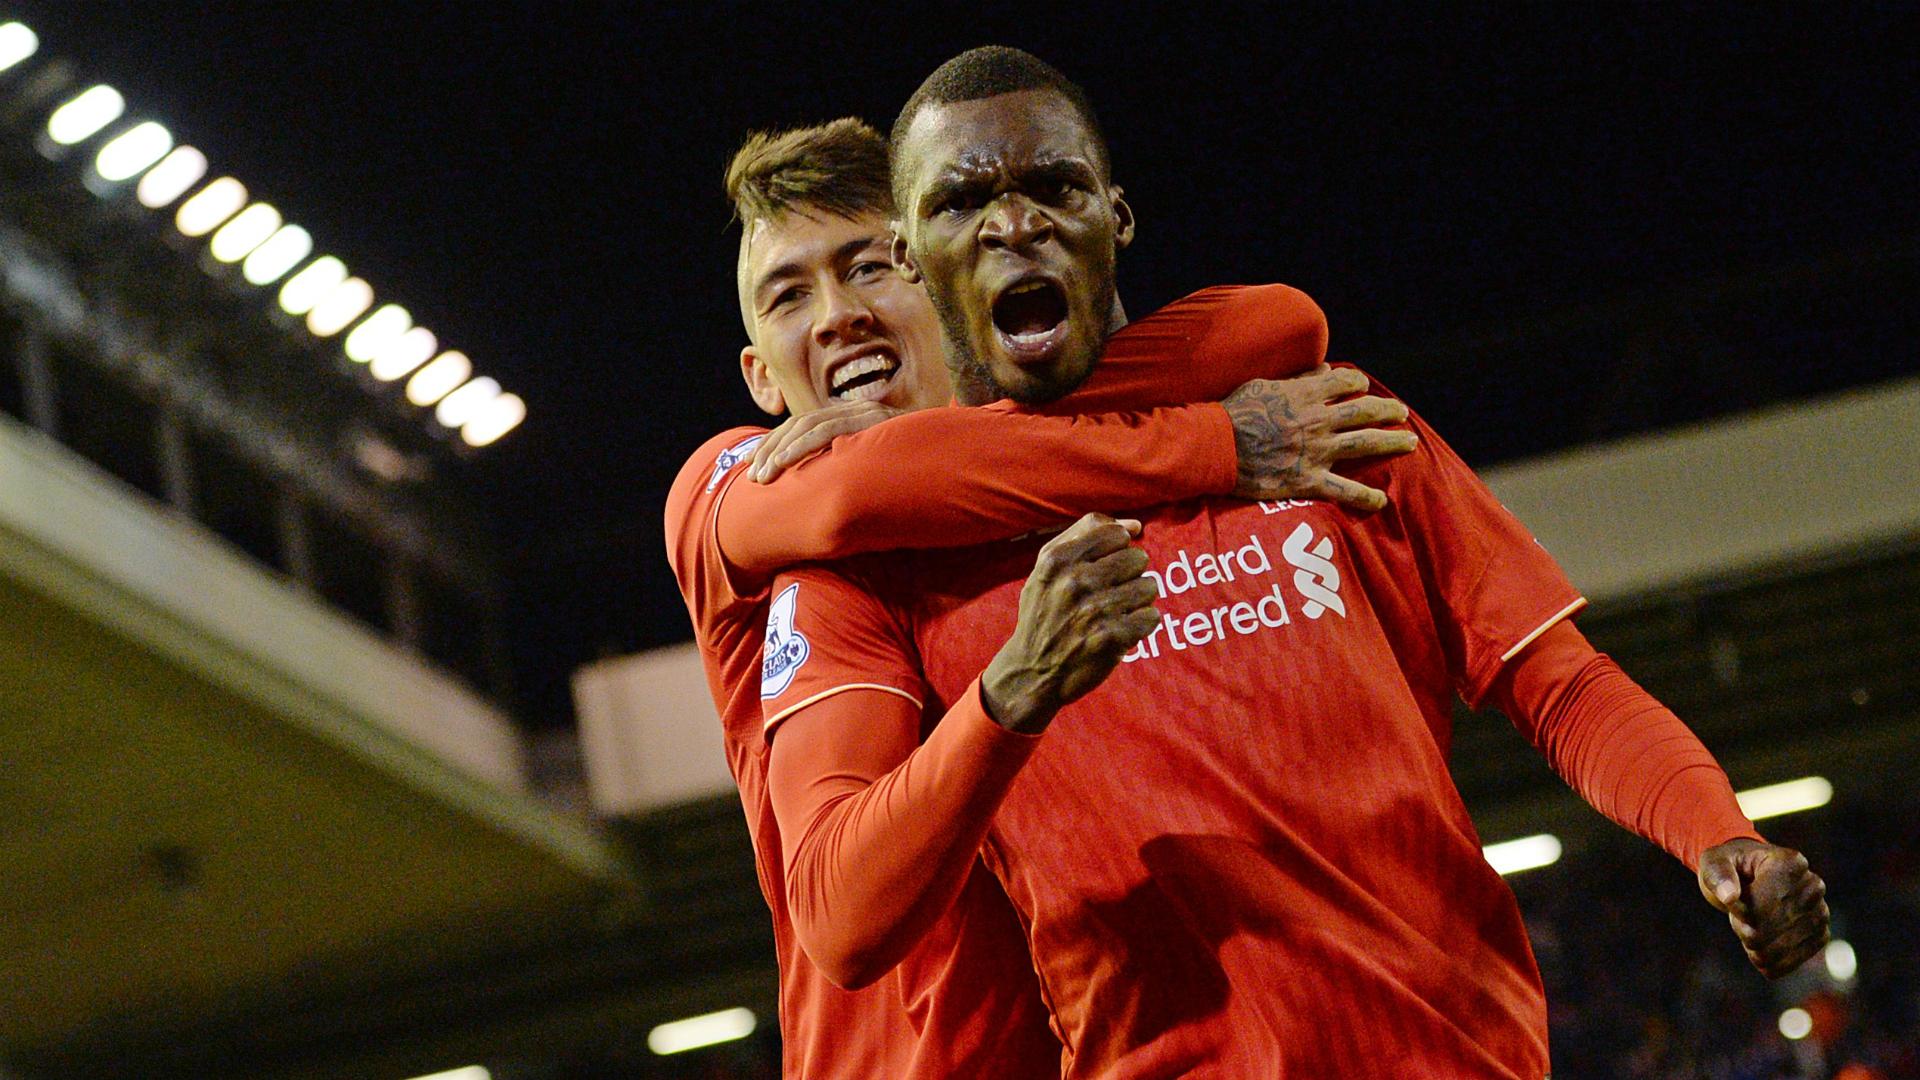 Mane affirms him, Salah are 'really good friends'